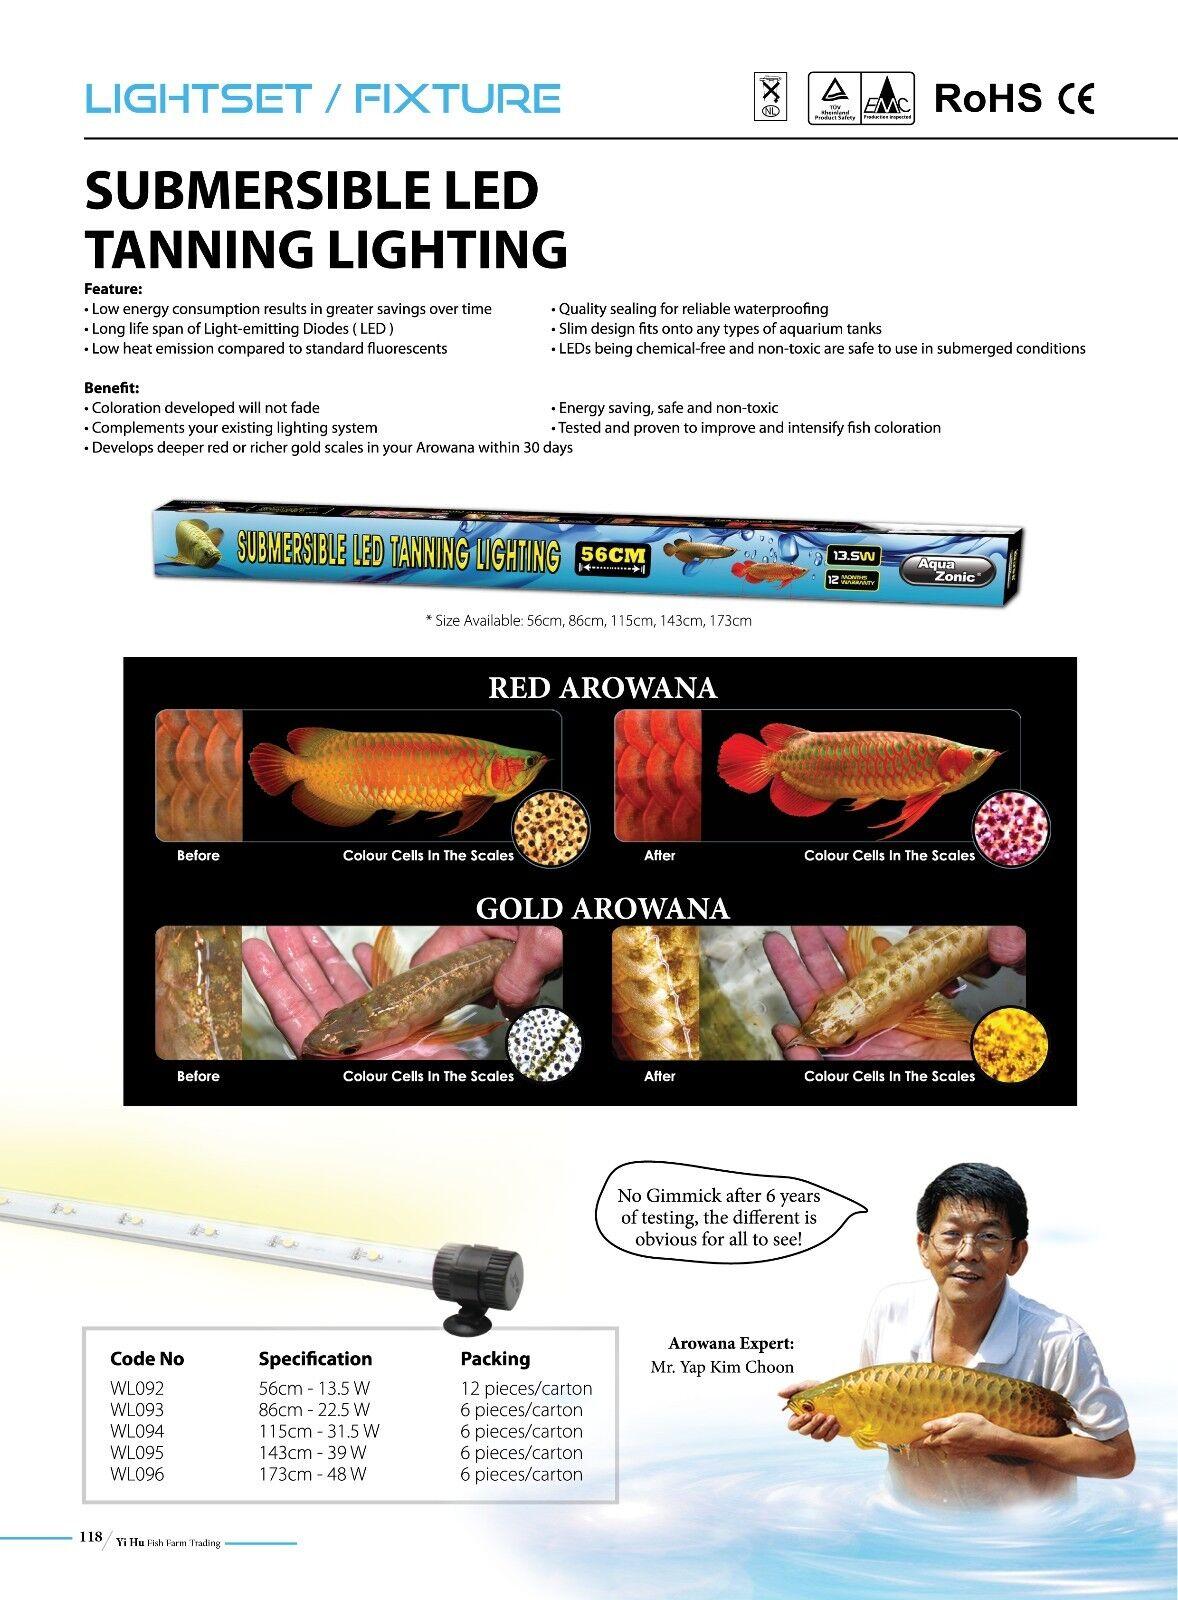 AQUAZONIC AROWANA LED TANNING LIGHT 115 CM 31.5 W SUBMERSIBLE